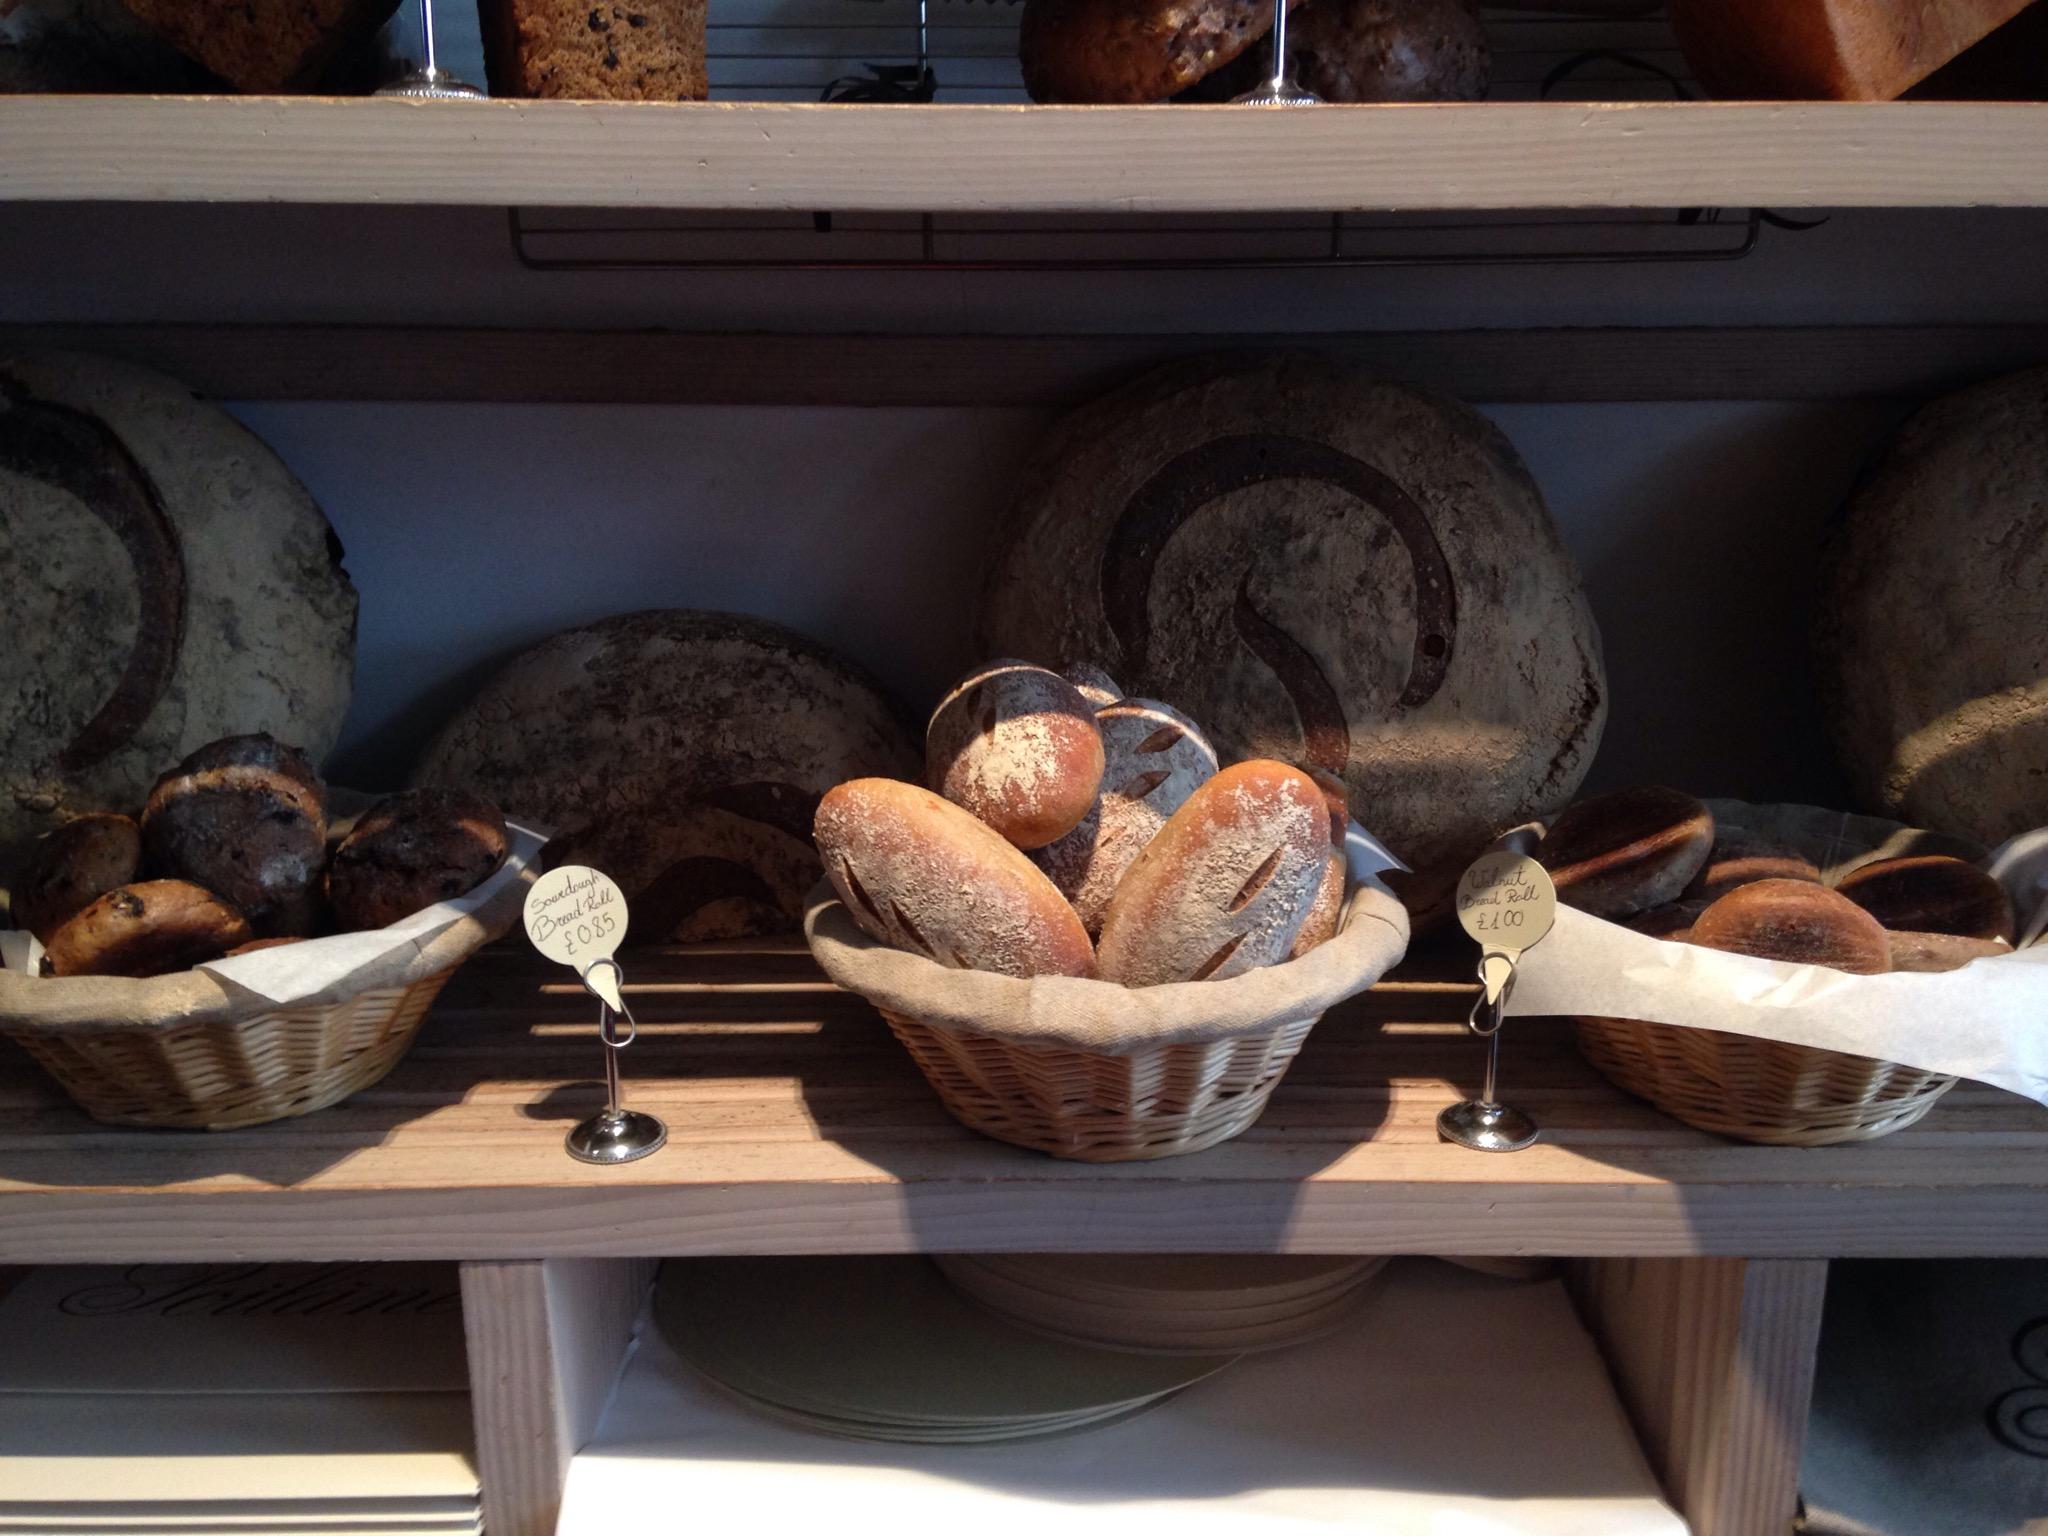 Cuisine De Bar poilane cuisine de bar, chelsea – hungry aphrodite